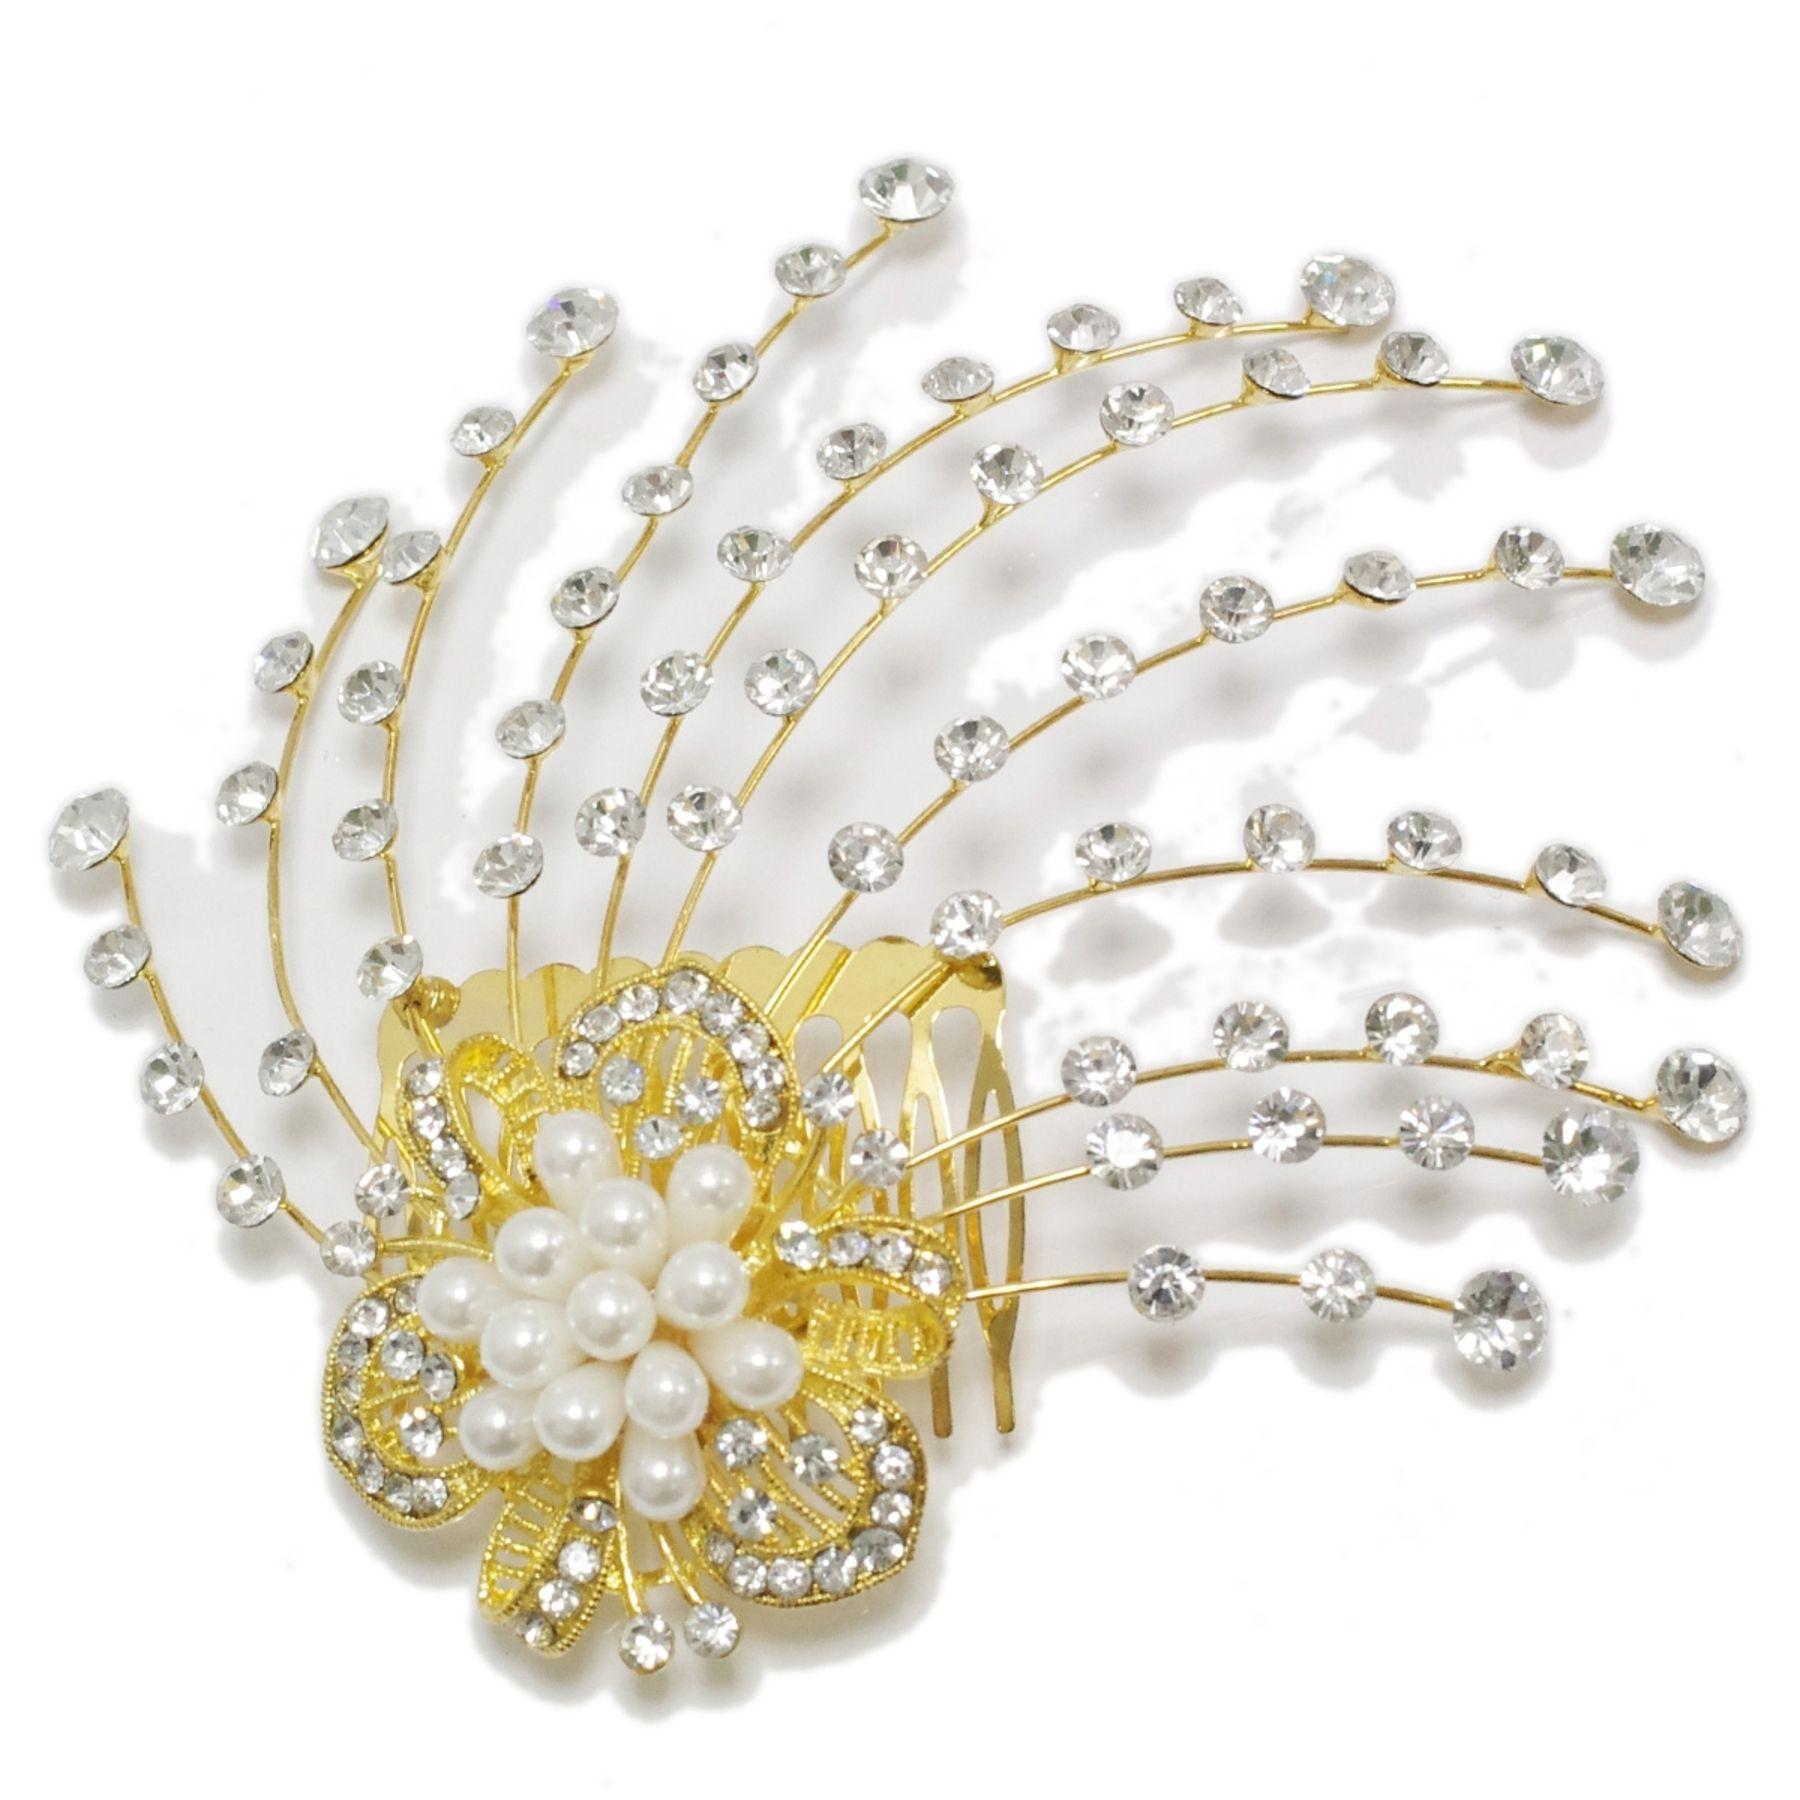 bijoux de cheveux fleurs perles strass 2033 or. Black Bedroom Furniture Sets. Home Design Ideas